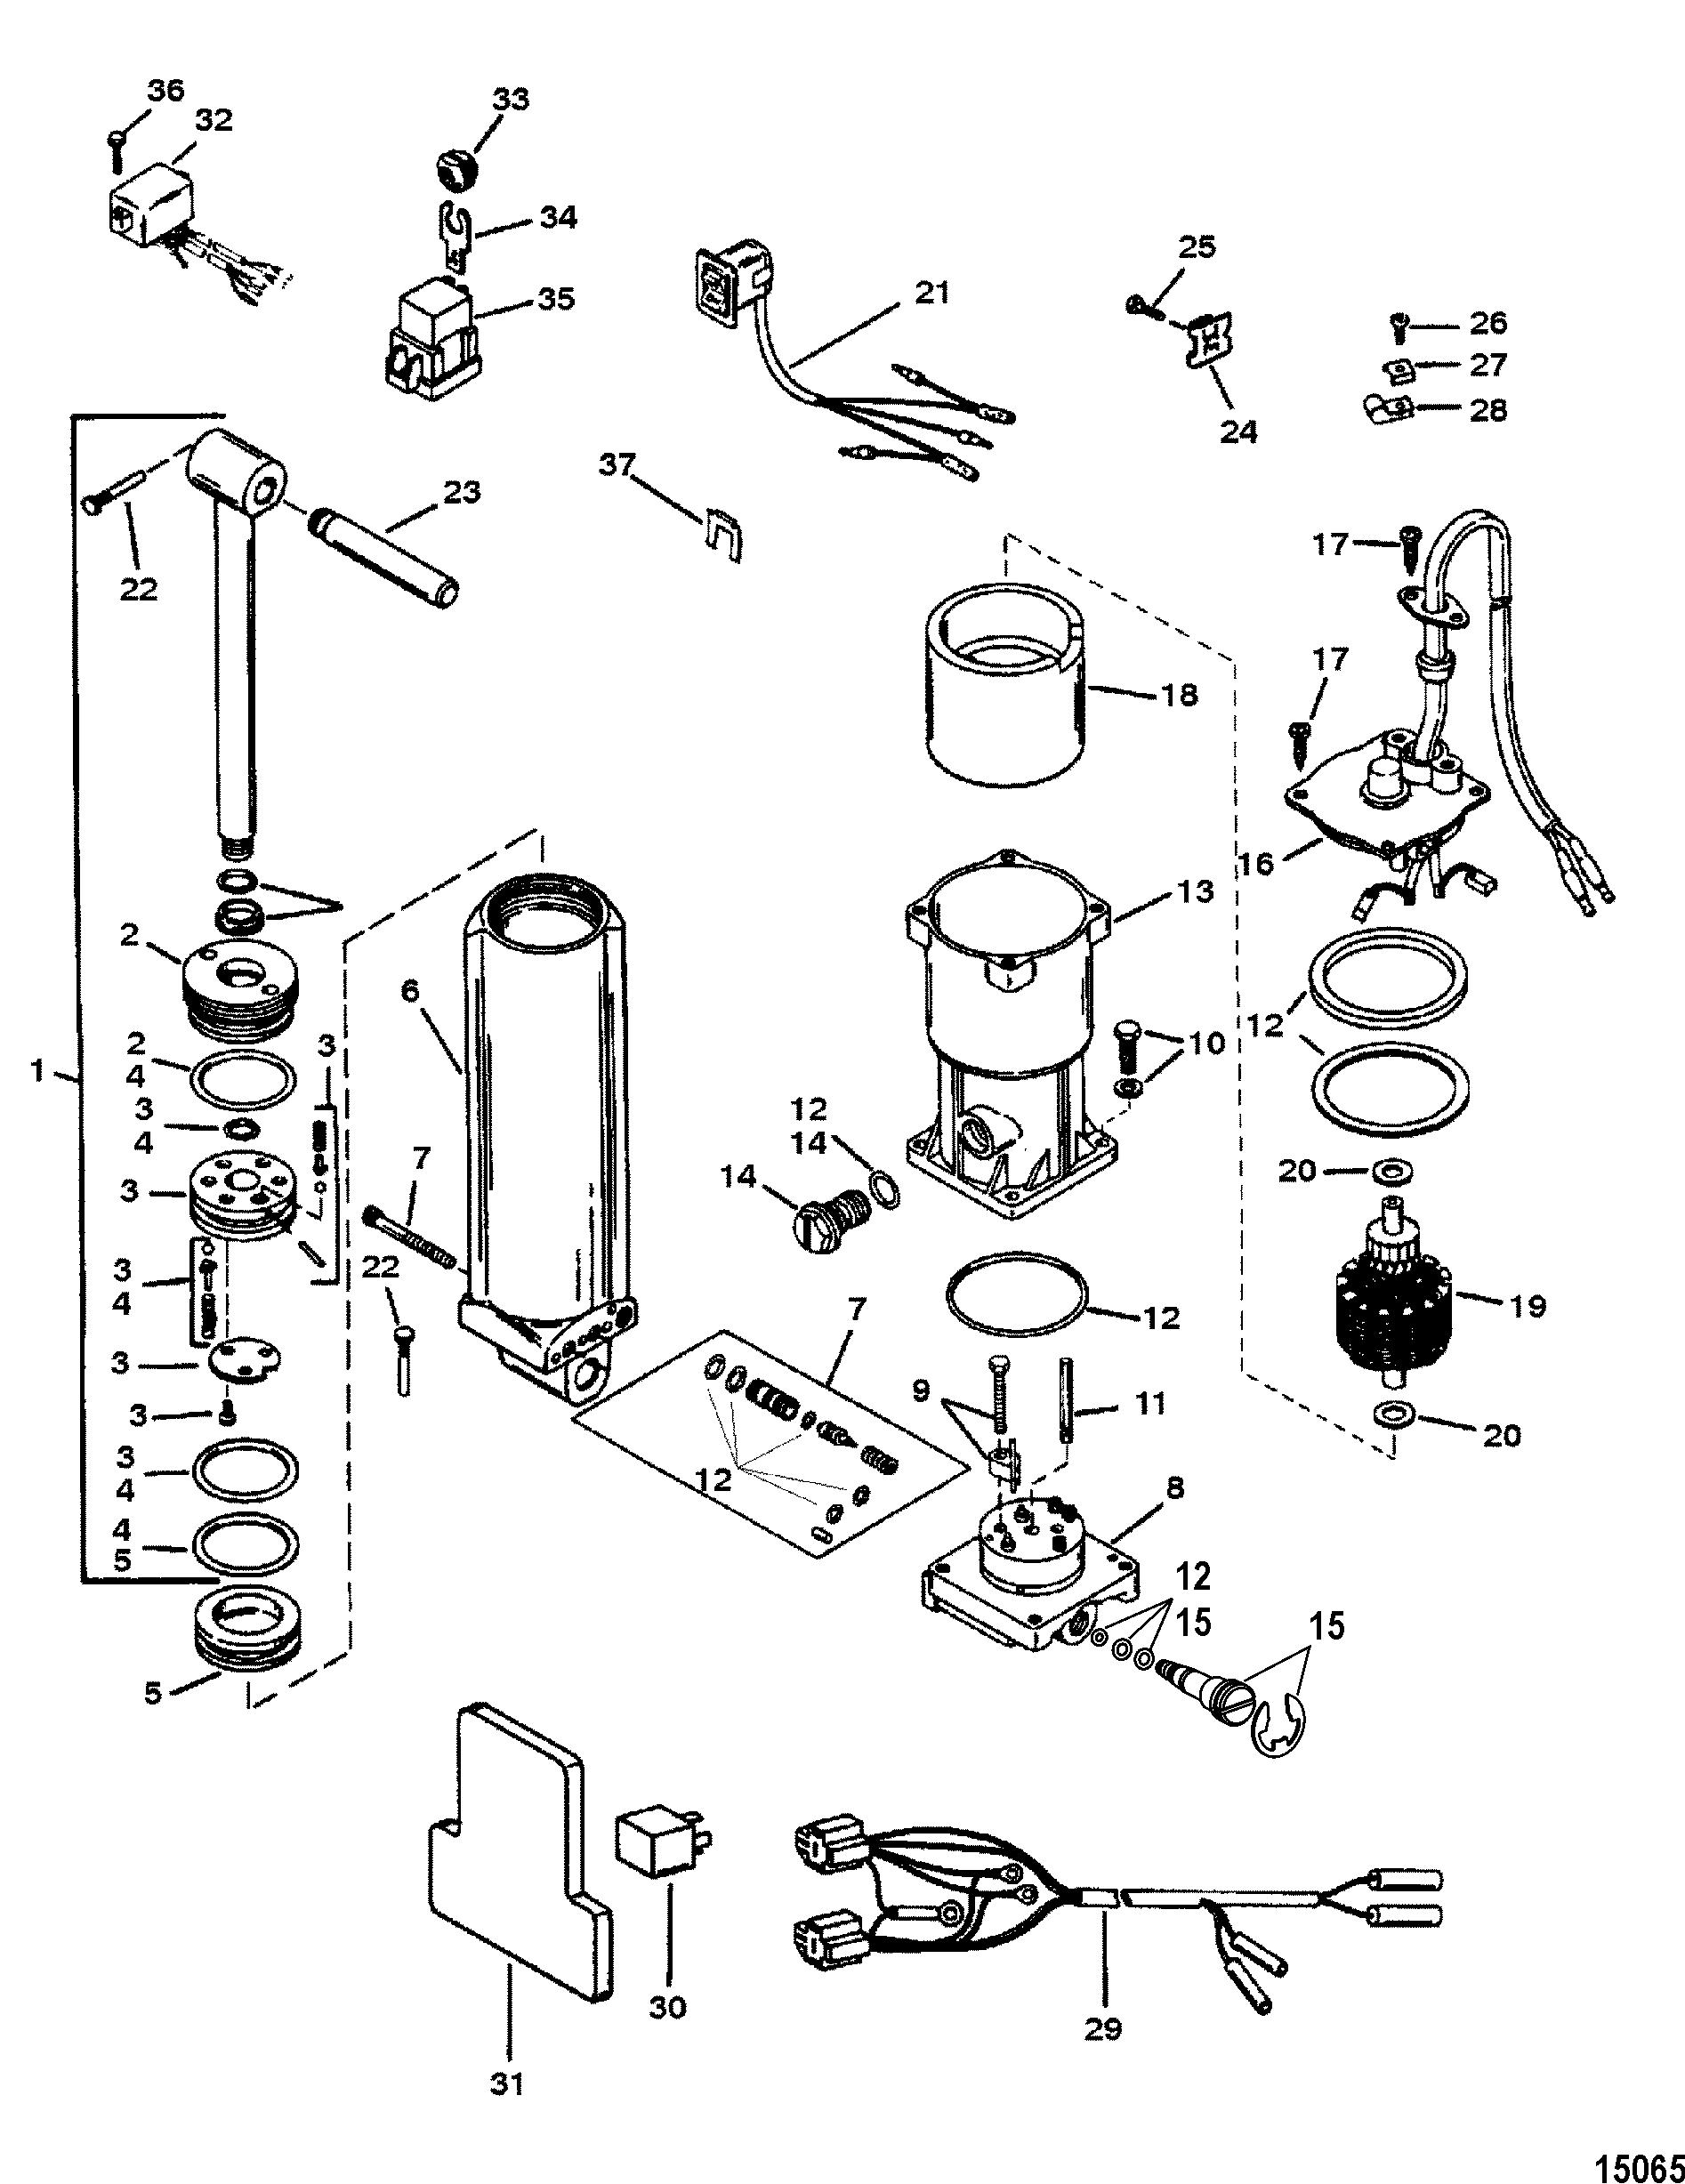 tohatsu 9.8 service manual pdf